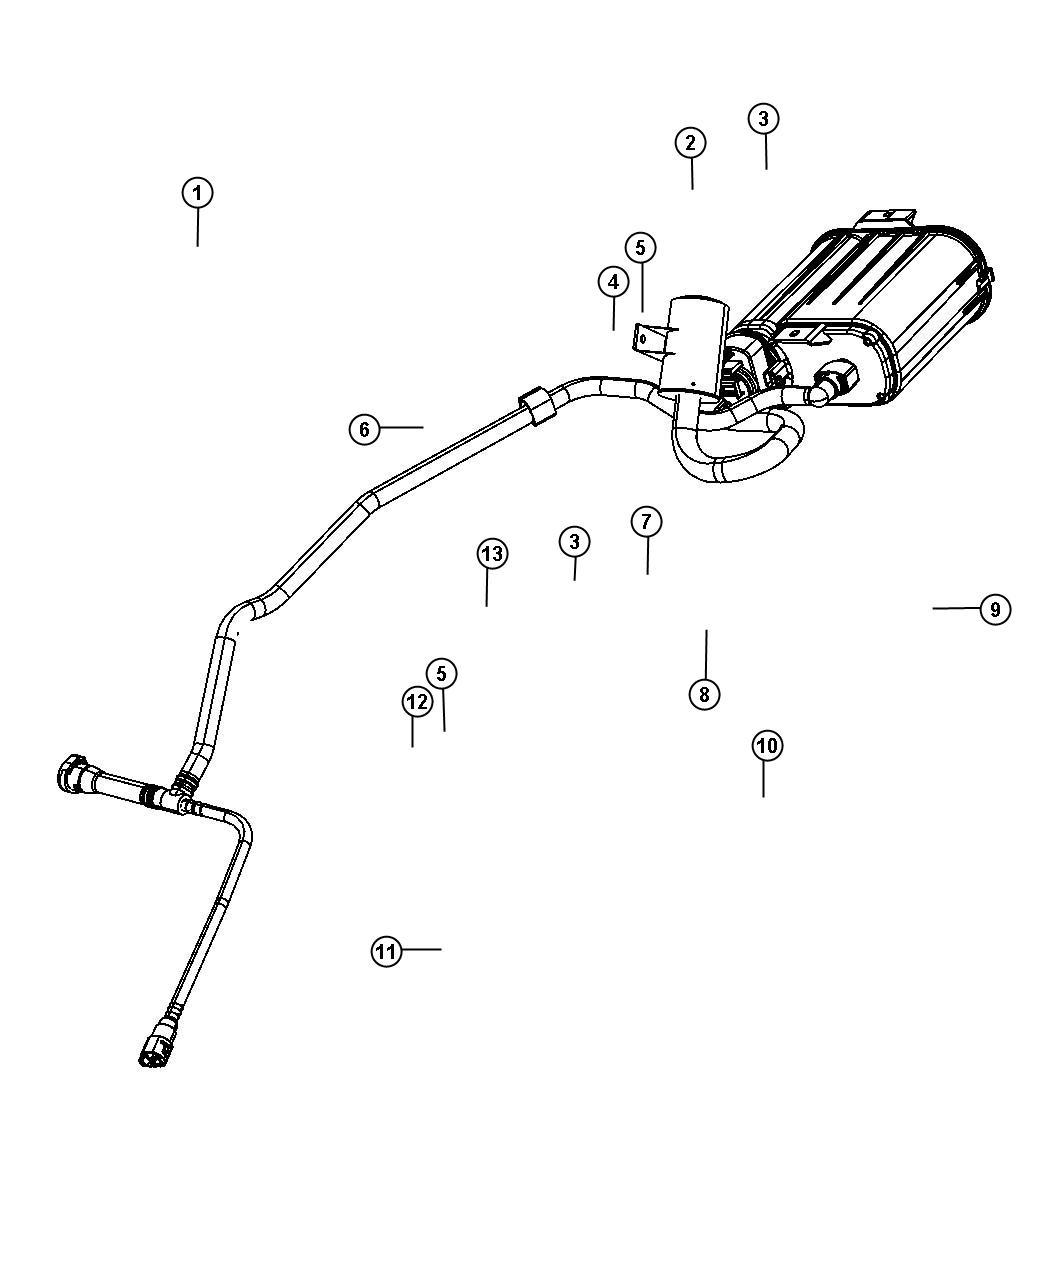 2012 Dodge Avenger Vapor Canister and Leak Detection Pump